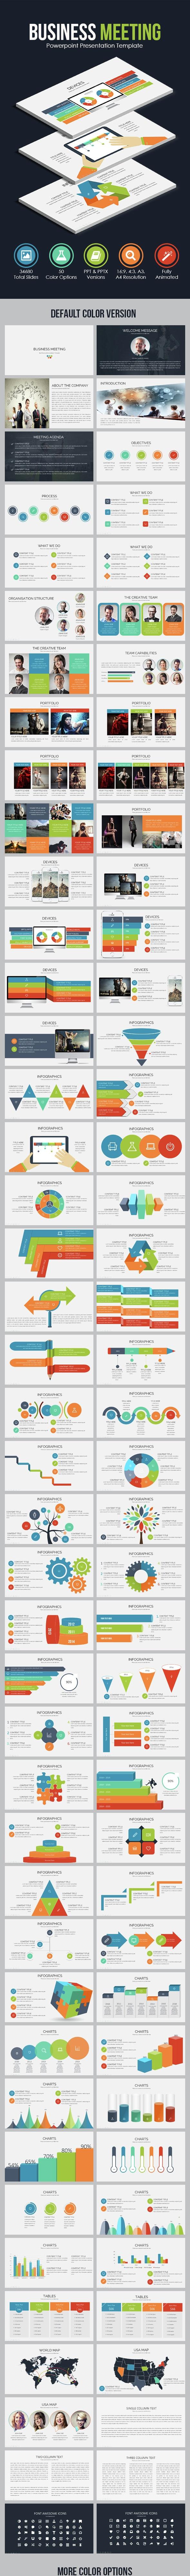 Business Meeting - Powerpoint Presentation Template - Business PowerPoint Templates